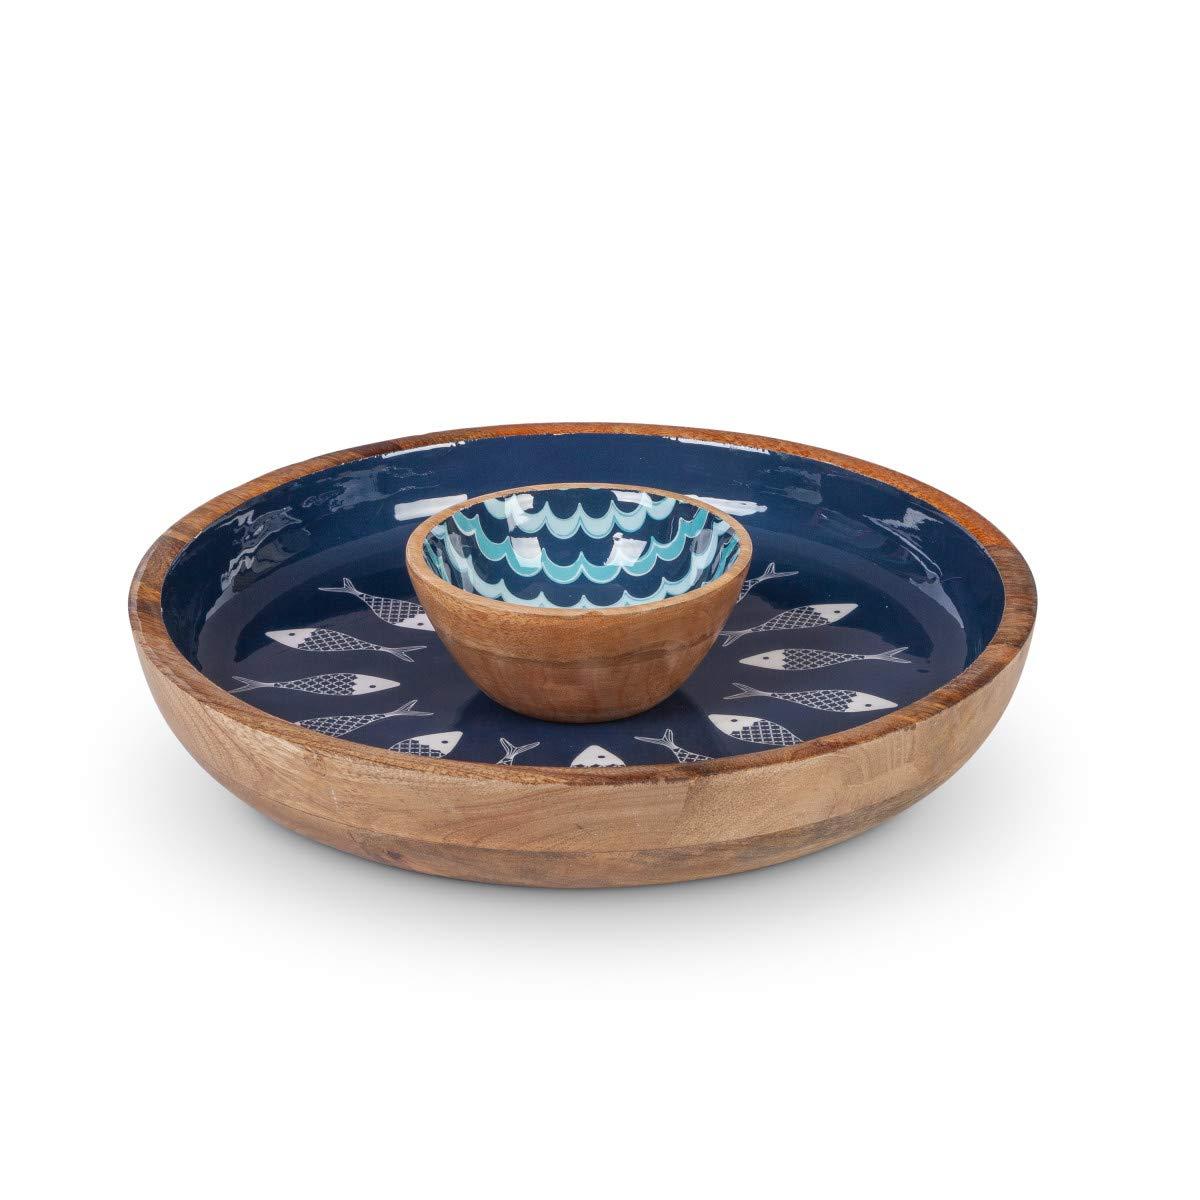 Gerson 2 pc Set, 12'' D x 3.5'' H Mango Wood Chip & Dip in Blue Fish/Wave Pattern